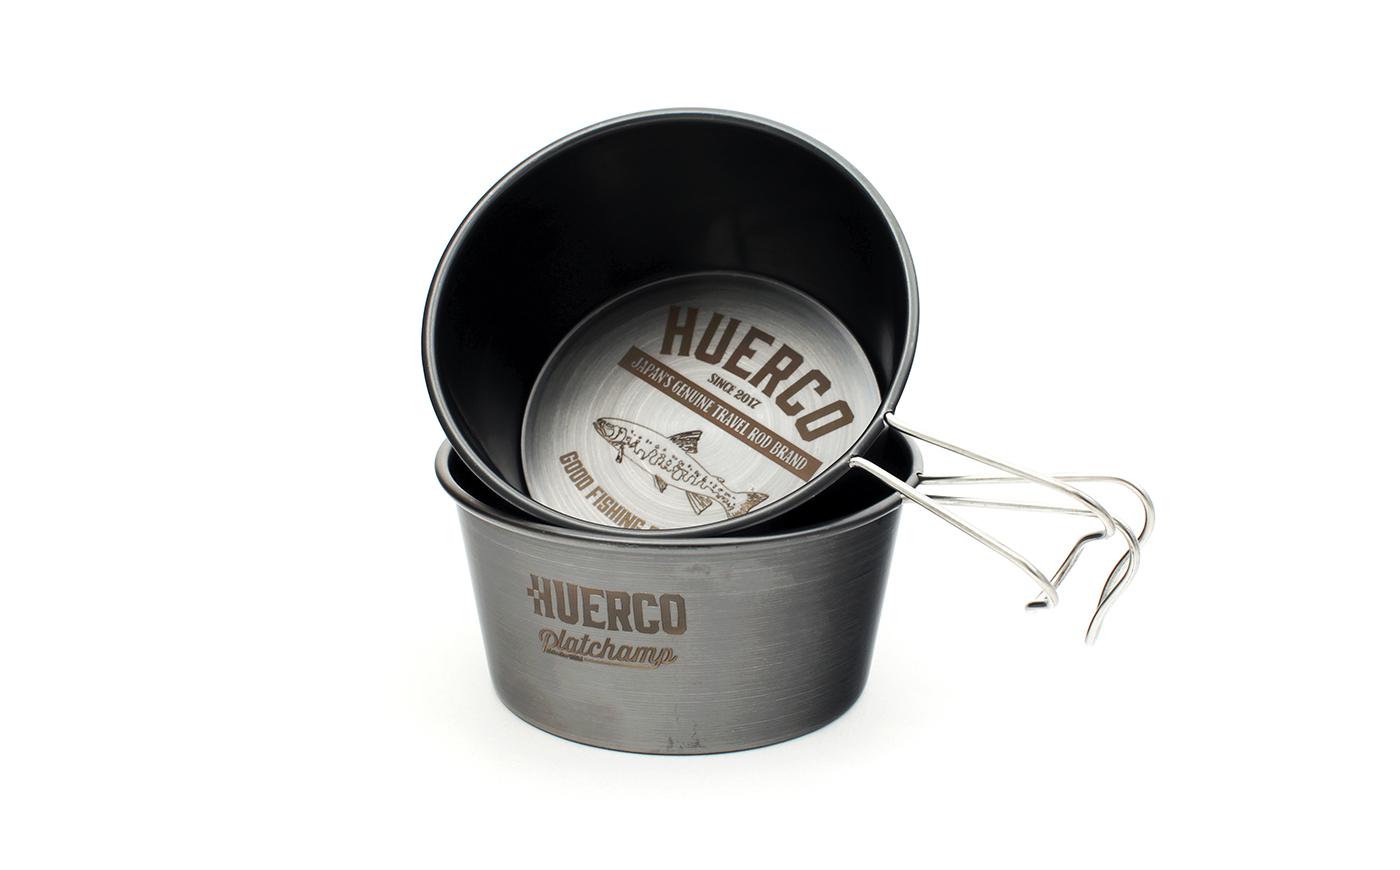 Huerco×Platchamp ロッキーカップ